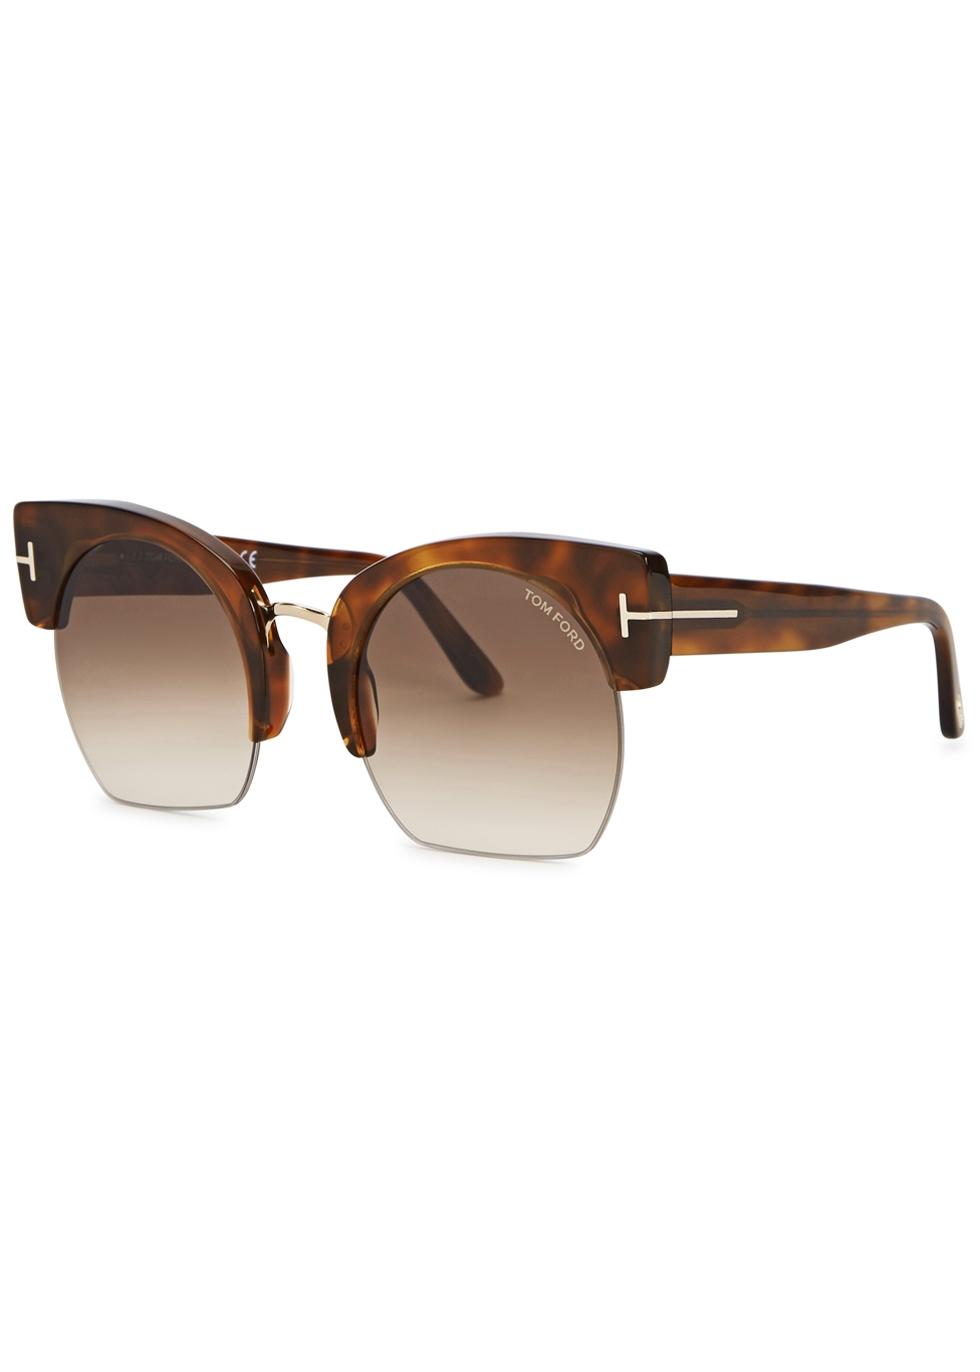 Savannah clubmaster-style sunglasses - Tom Ford Eyewear